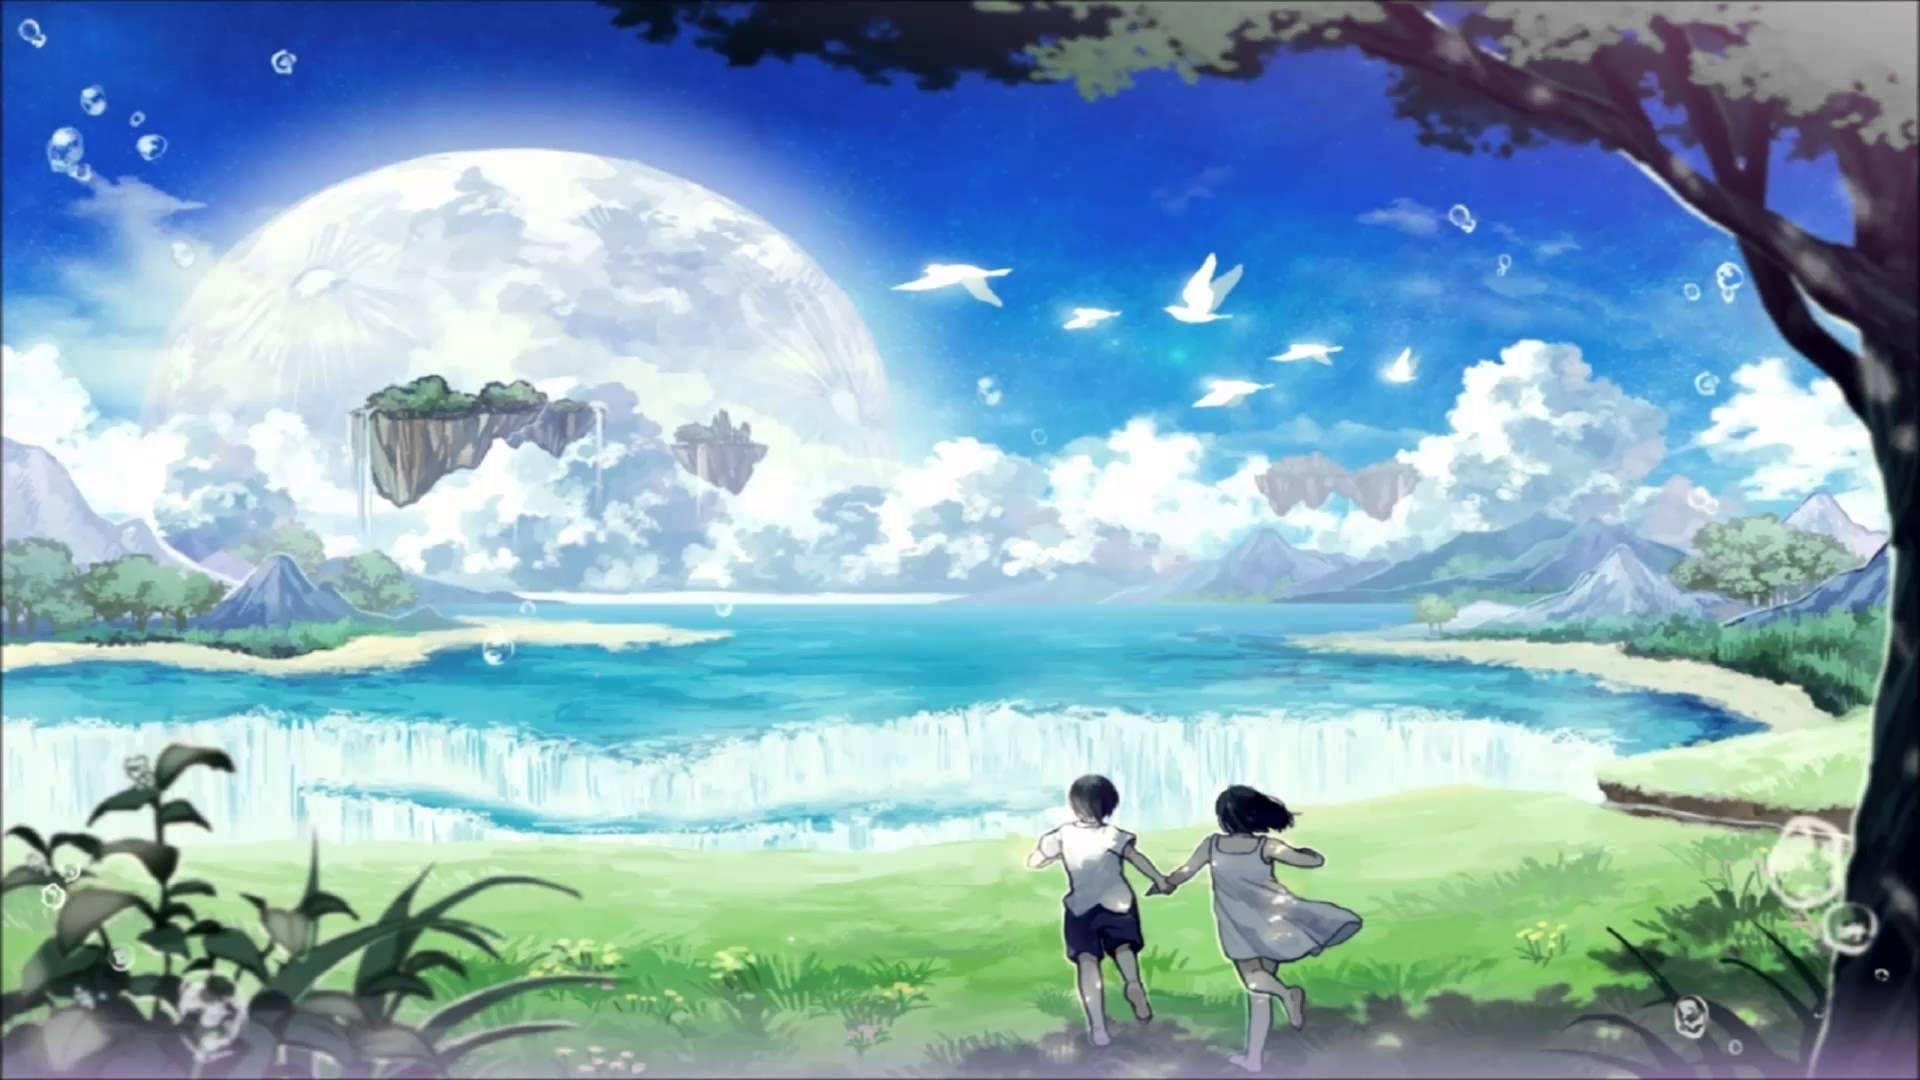 Phone call anime scenery anime background